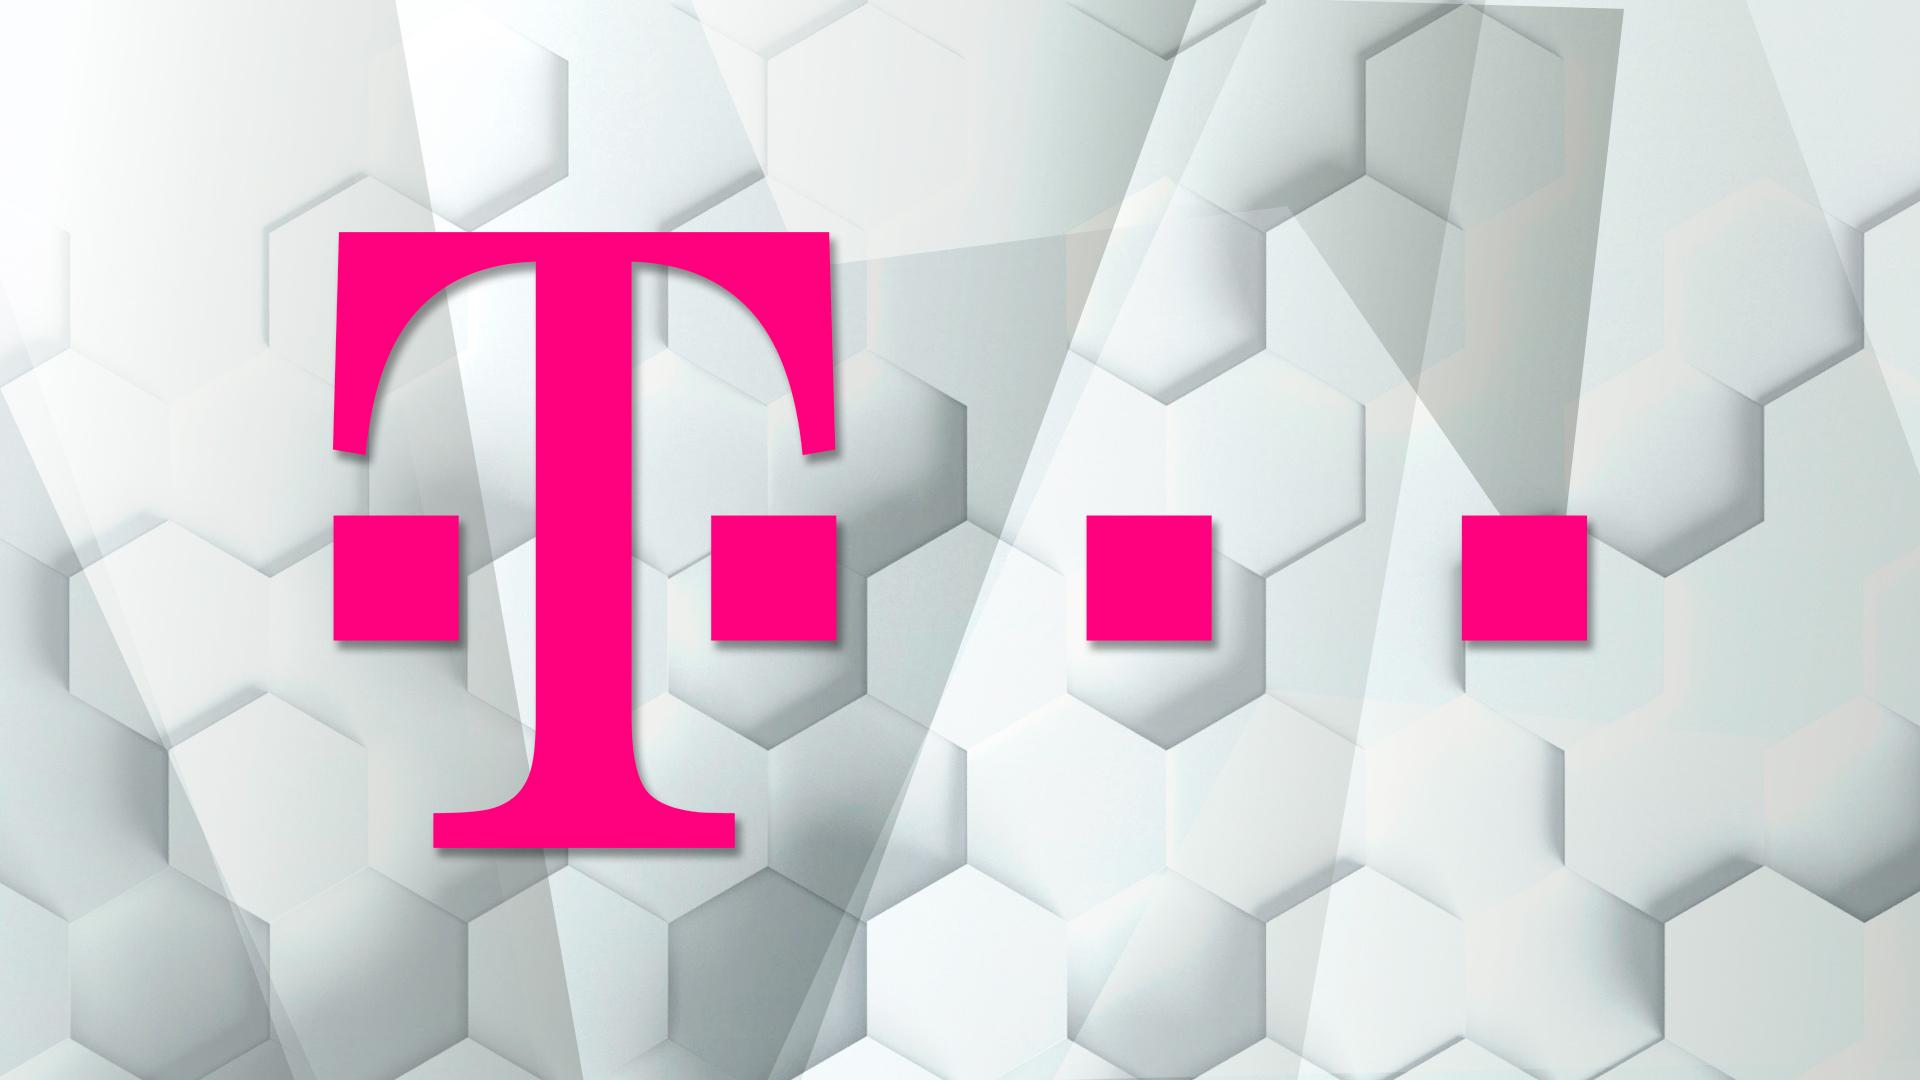 Logo, Mobilfunk, Deutsche Telekom, Telekom, Provider, T-Mobile, Netzbetreiber, Mobilfunkanbieter, Mobilfunkbetreiber, Isp, Telekommunikationsunternehmen, Mobilfunktarif, T-Online, T-Systems